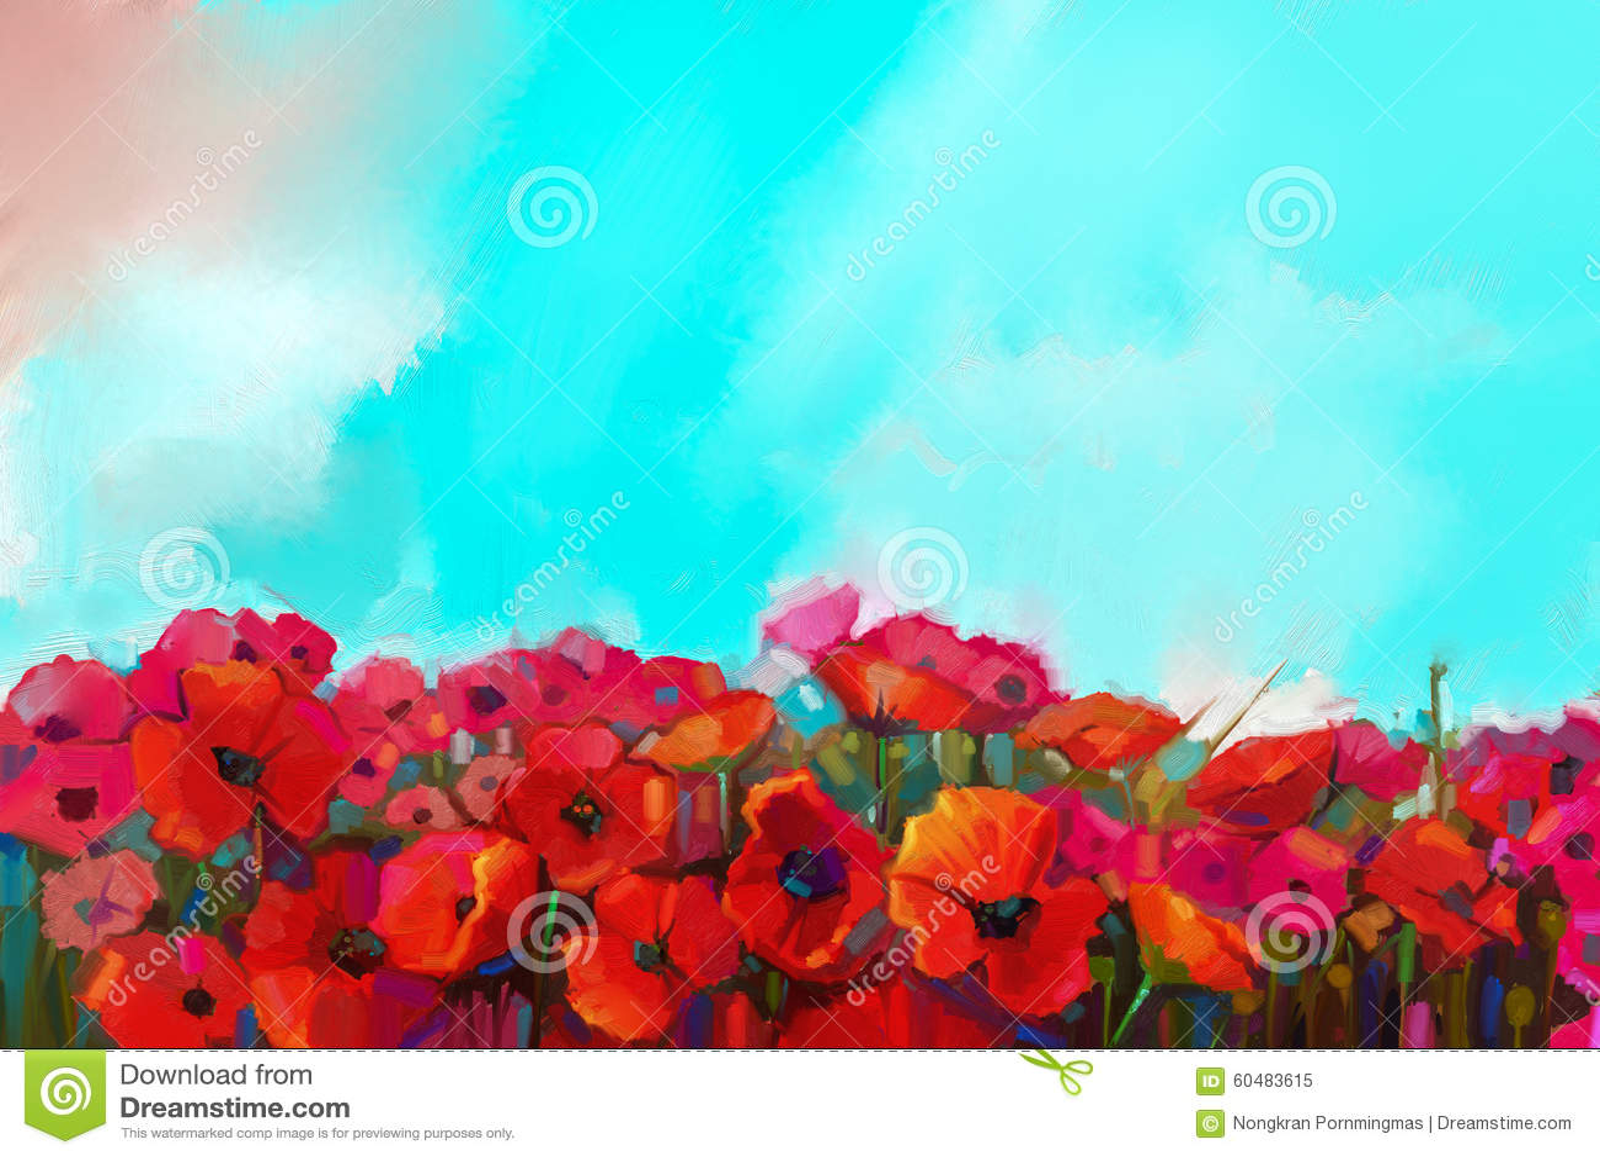 Flower Field Oil Painting